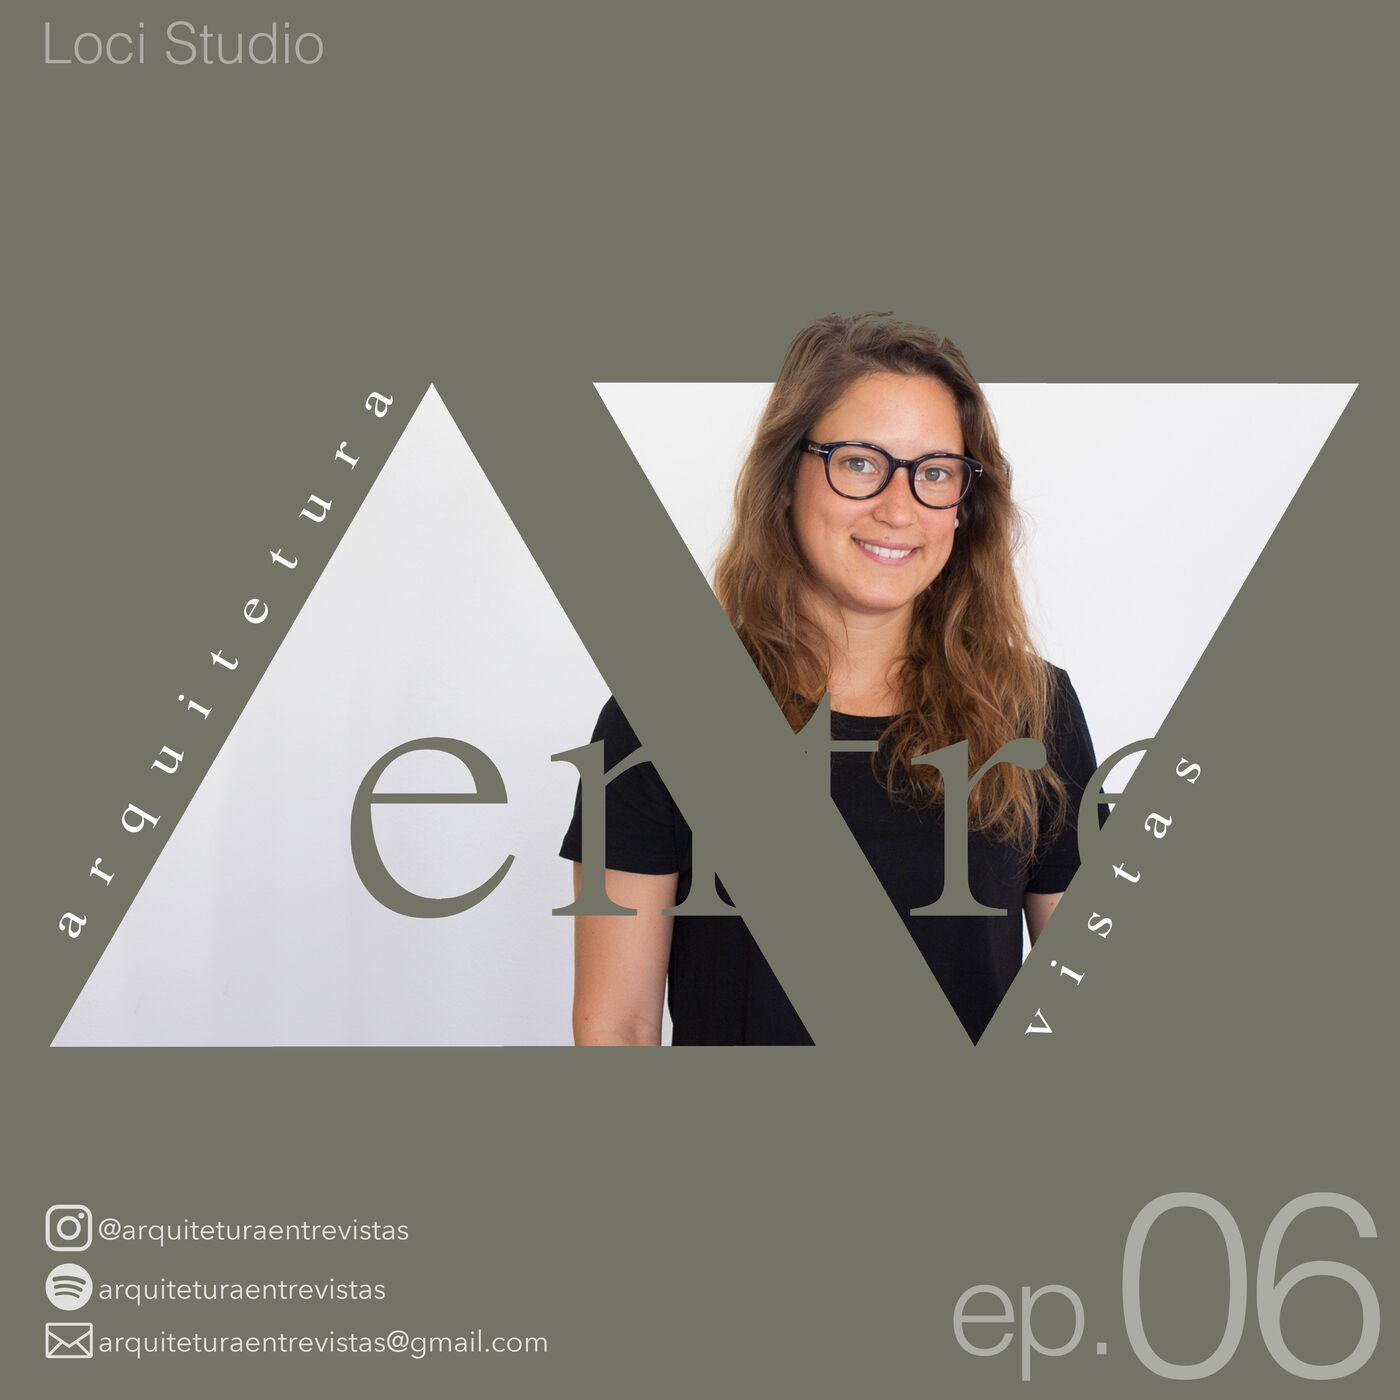 EP.6 LociStudio, Arquitetura Entre Vistas